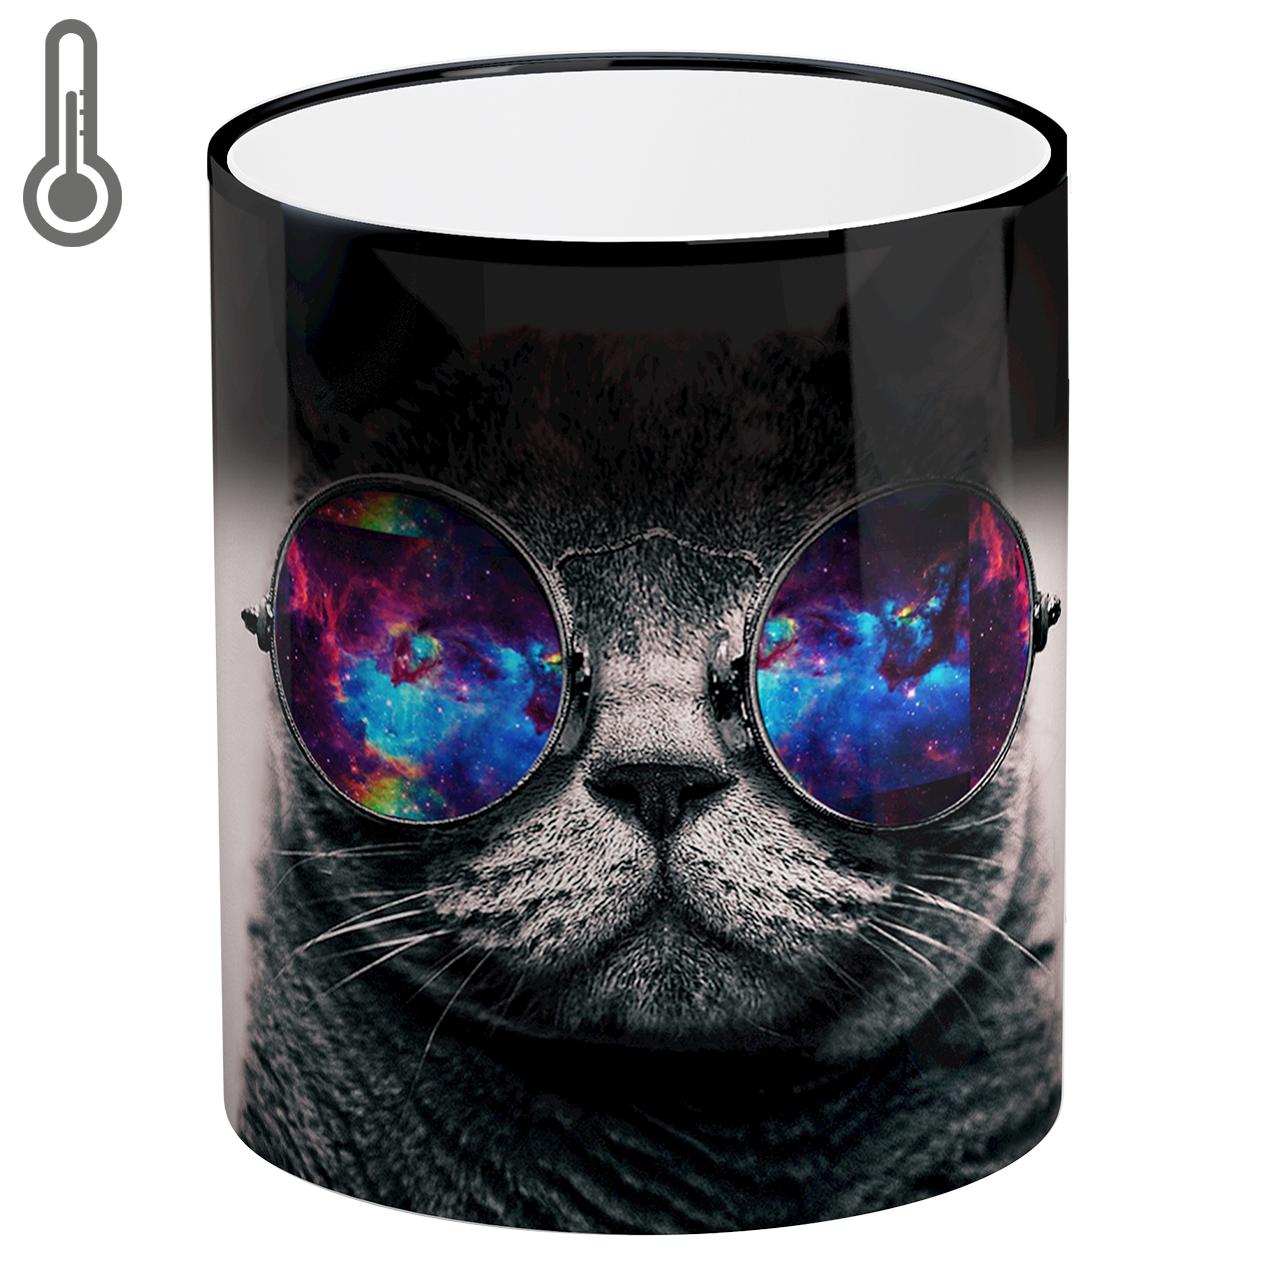 ماگ حرارتی لومانا طرح گربه کد MAG1604